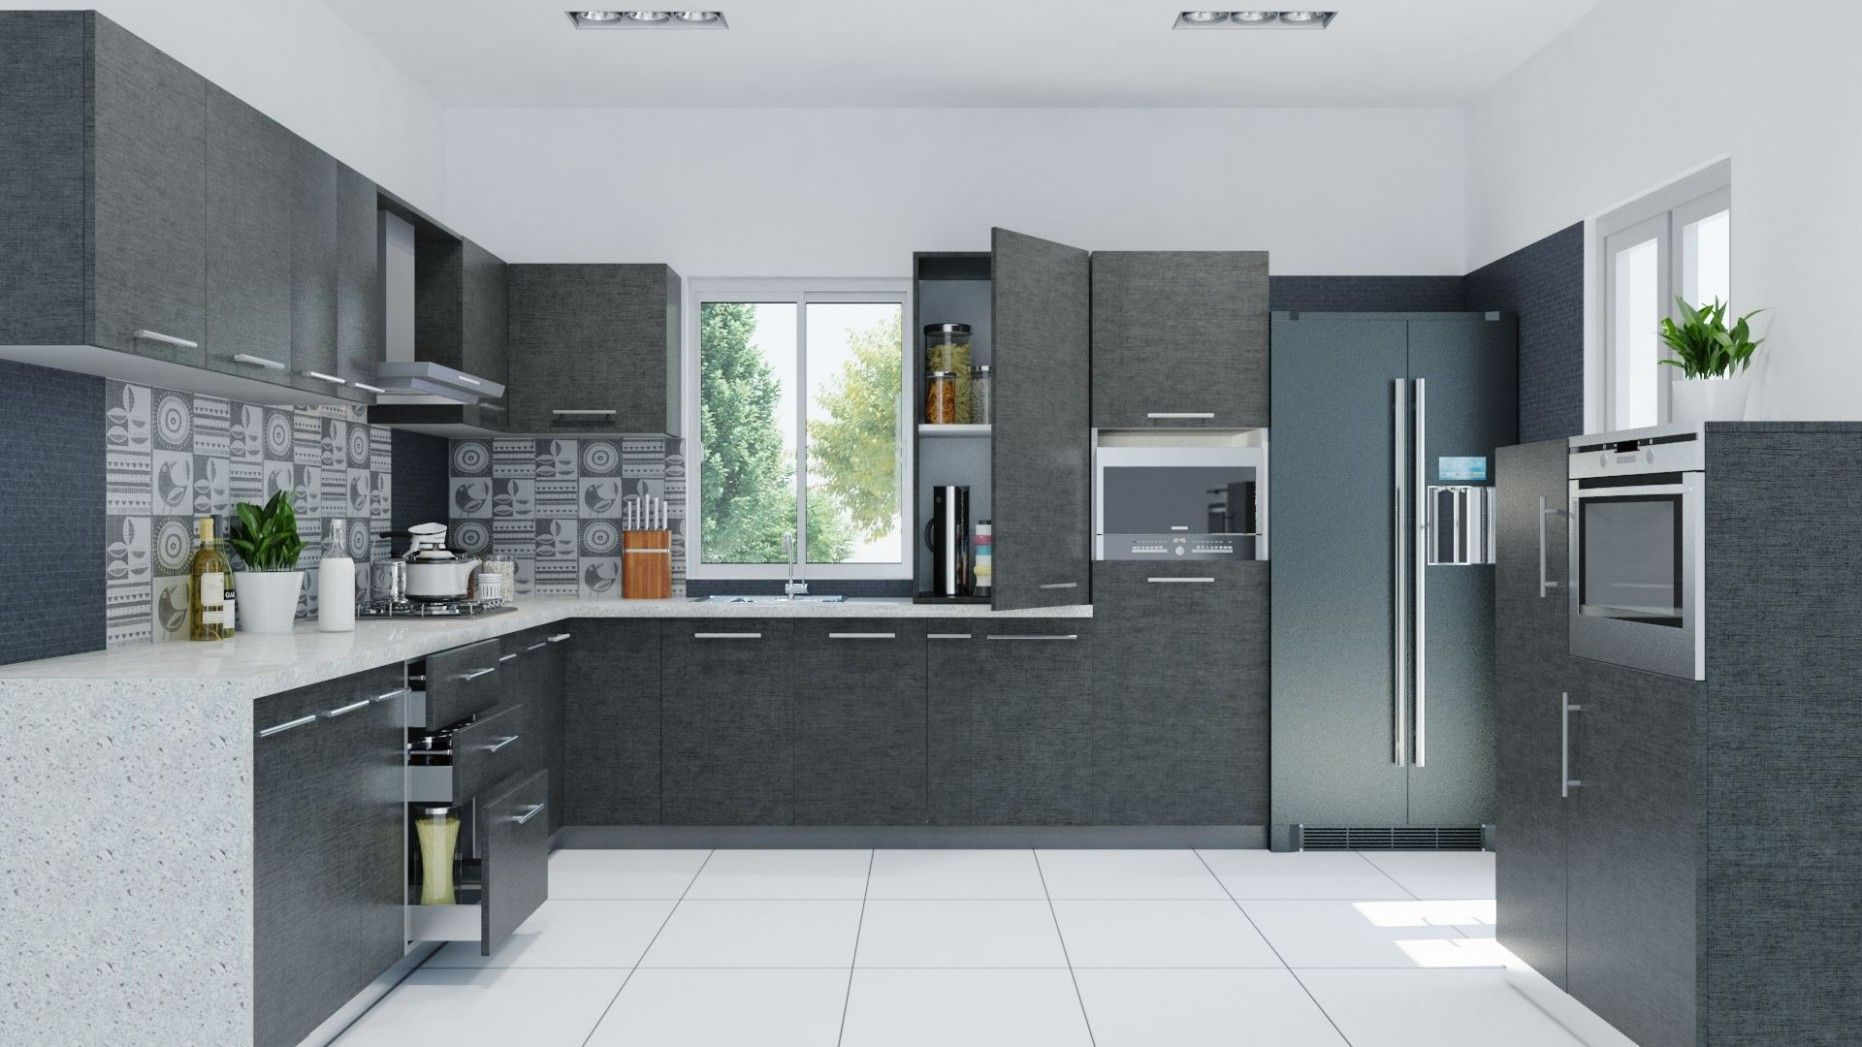 5 Clarifications On Modern Kitchen Cabinets Design Black And White Dapur Modern Desain Dapur Desain